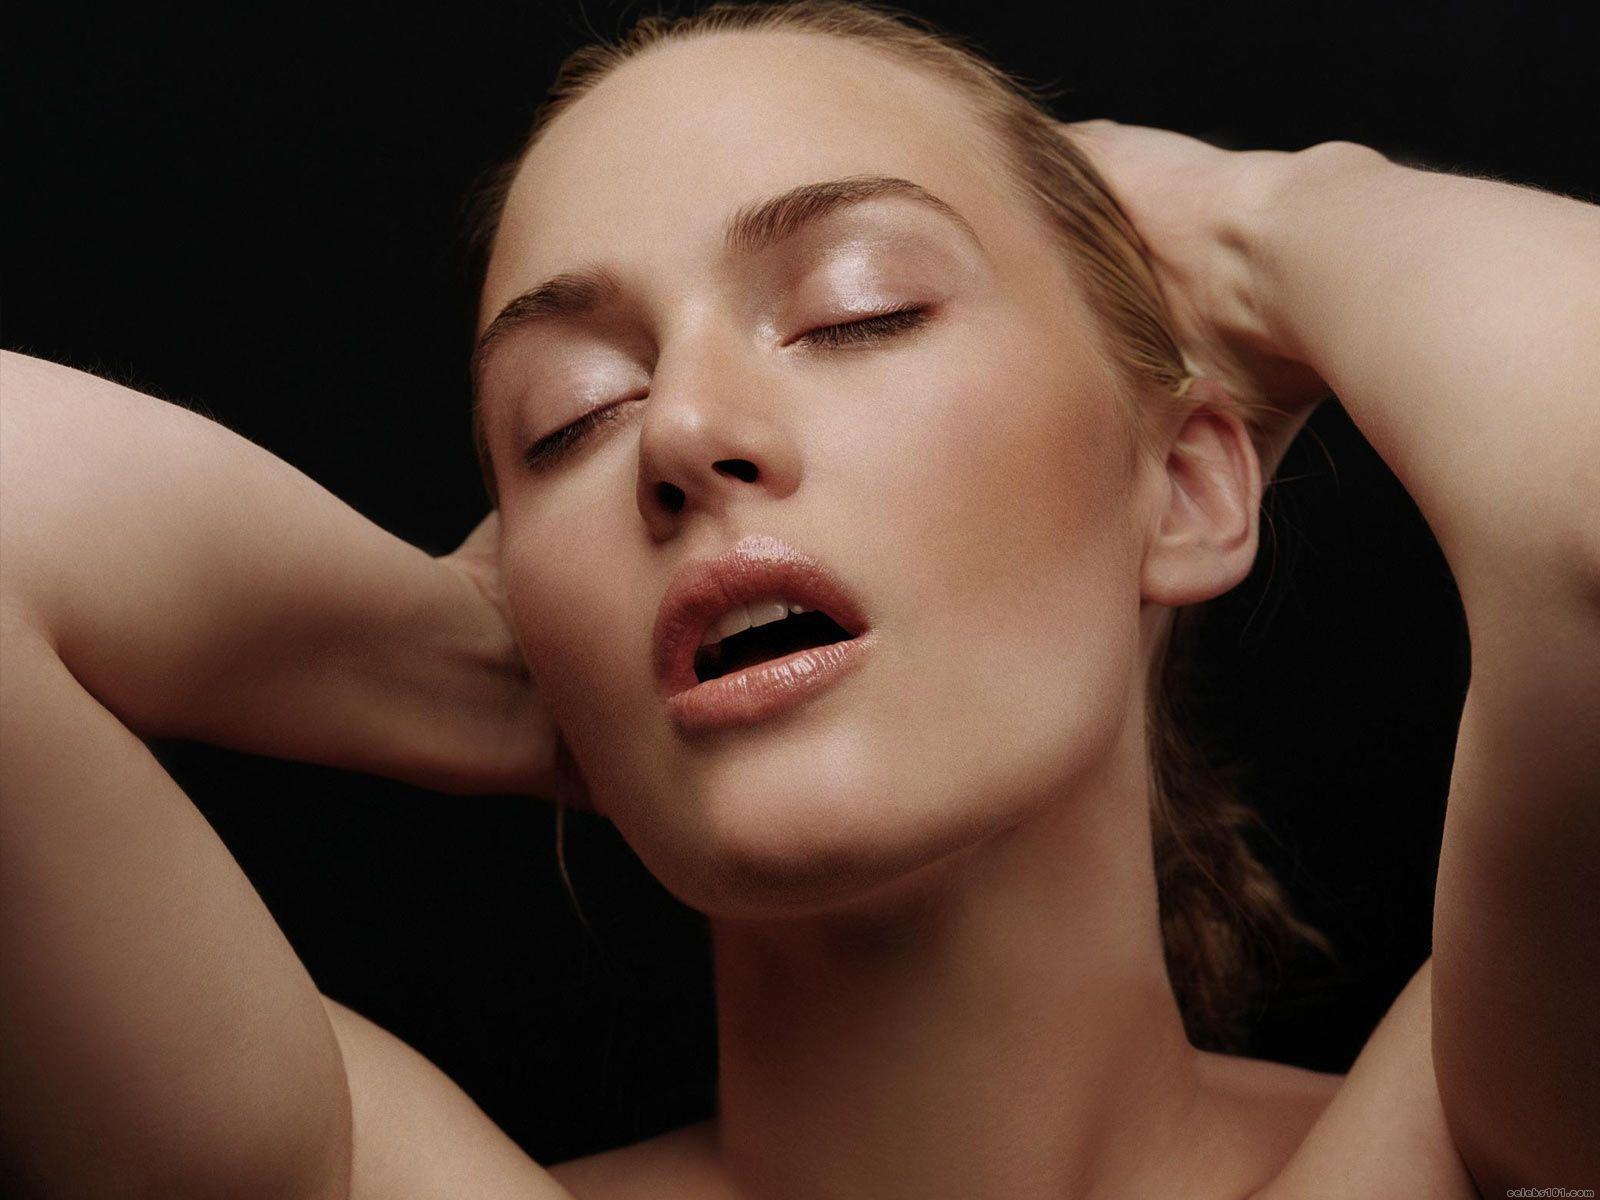 Asiatische Kate Winslet Dusche